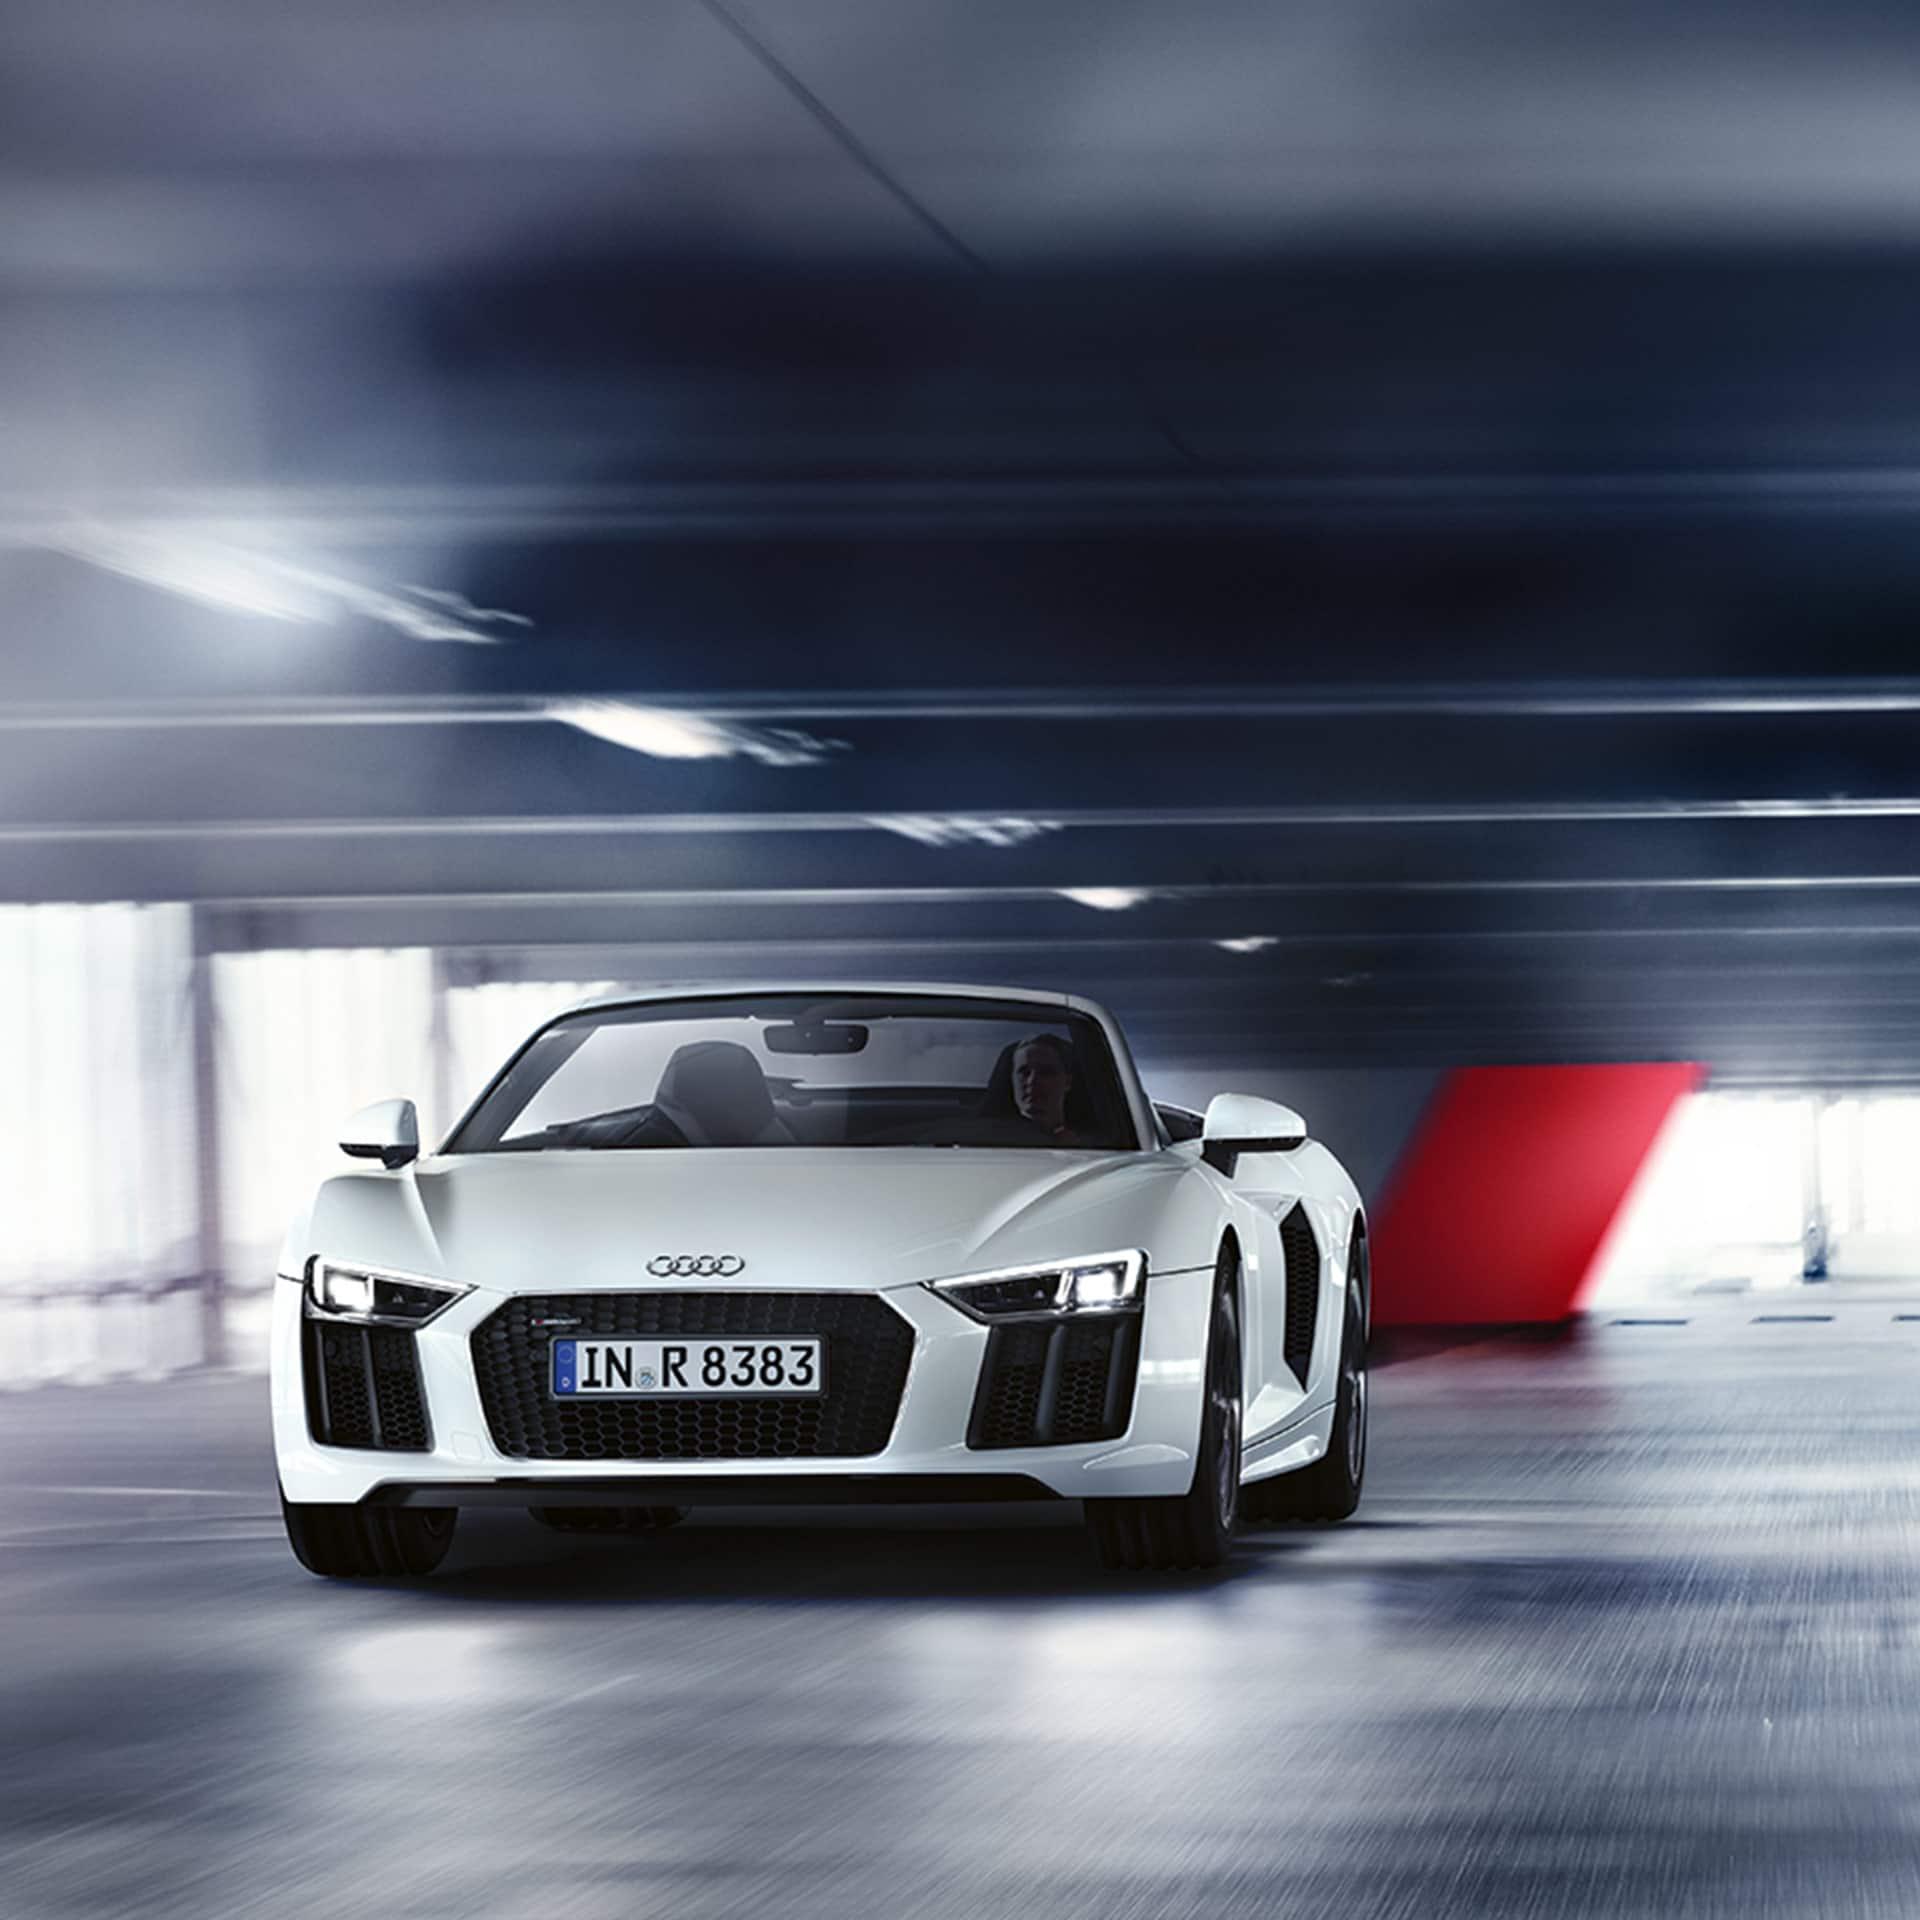 Audi R8: R8 Spyder V10 RWS > R8 > Audi Ireland